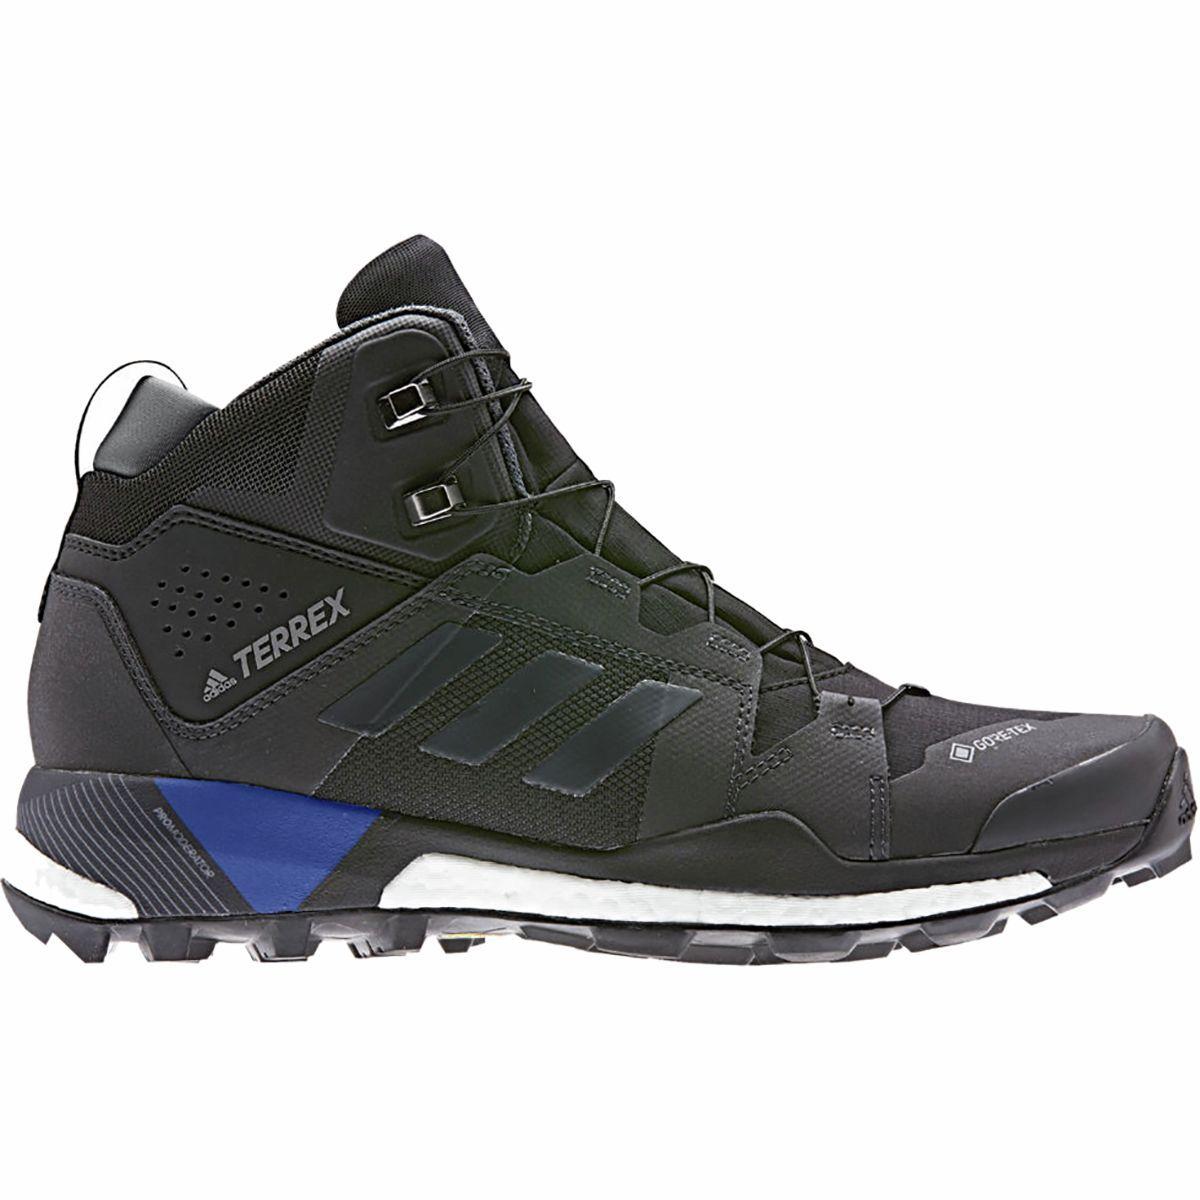 Adidas Outdoor Terrex Skychaser Xt Gtx Mid Hiking Boot Men S Hiking Boots Boots Hiking Shoes